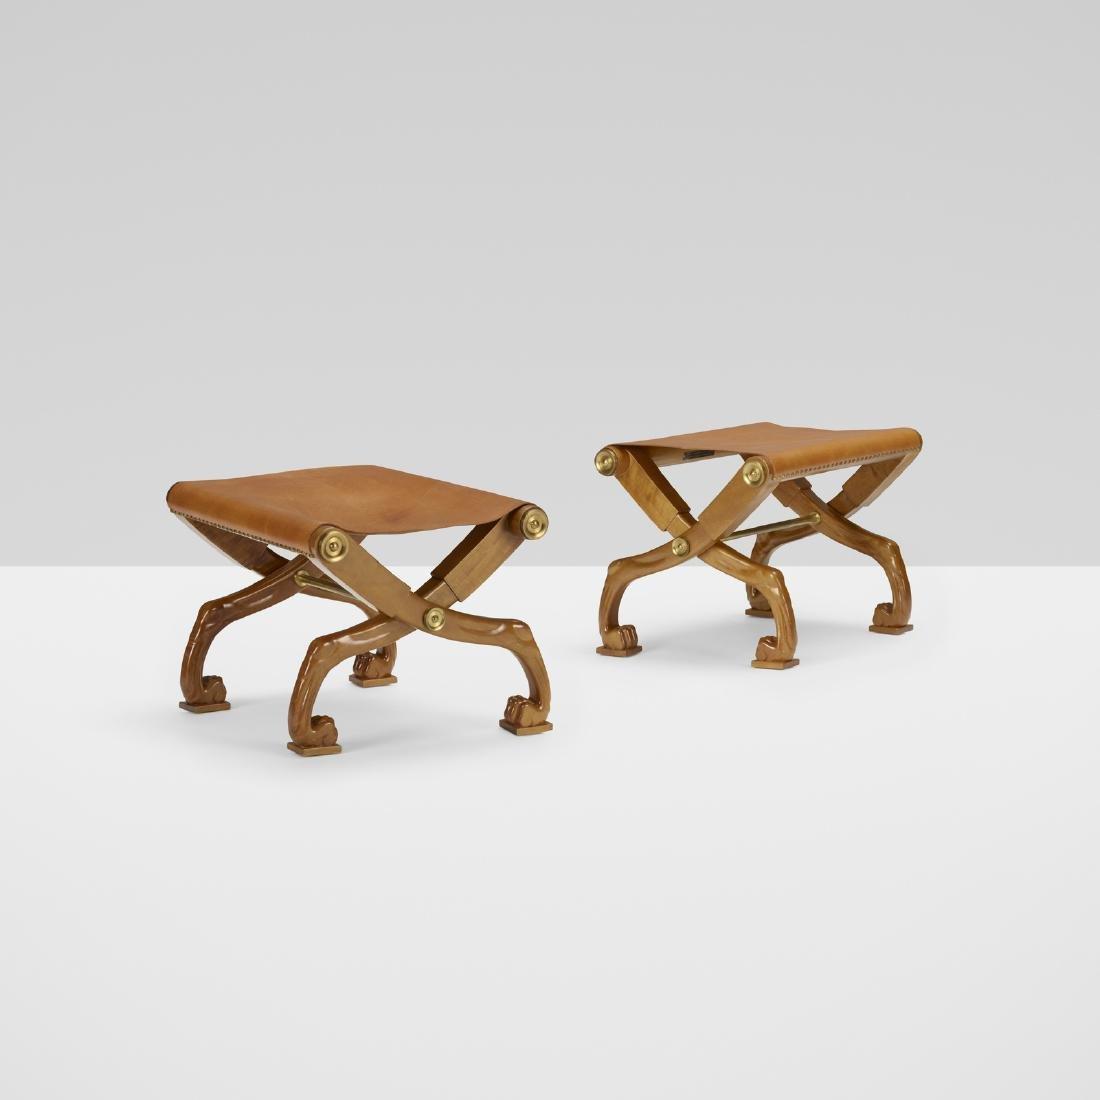 T.H. Robsjohn-Gibbings, Diphros Okladias folding stools